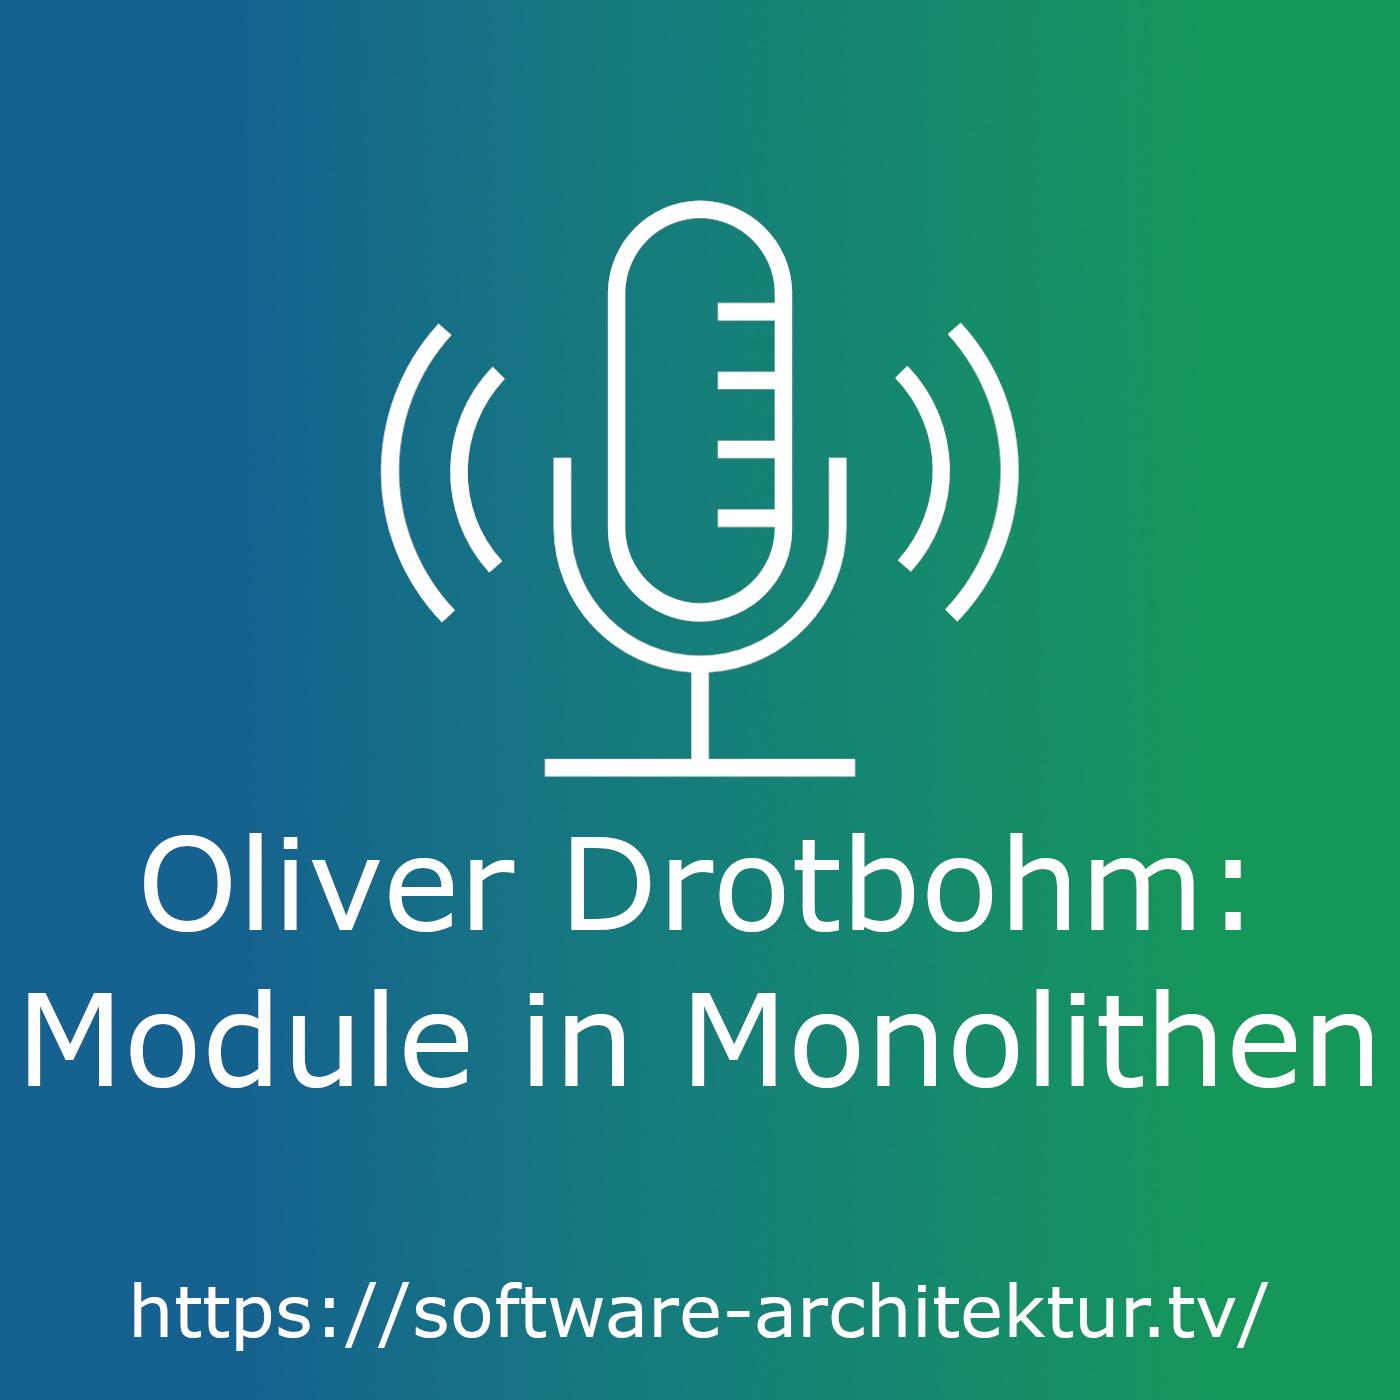 Oliver Drotbohm - Module in Monolithen